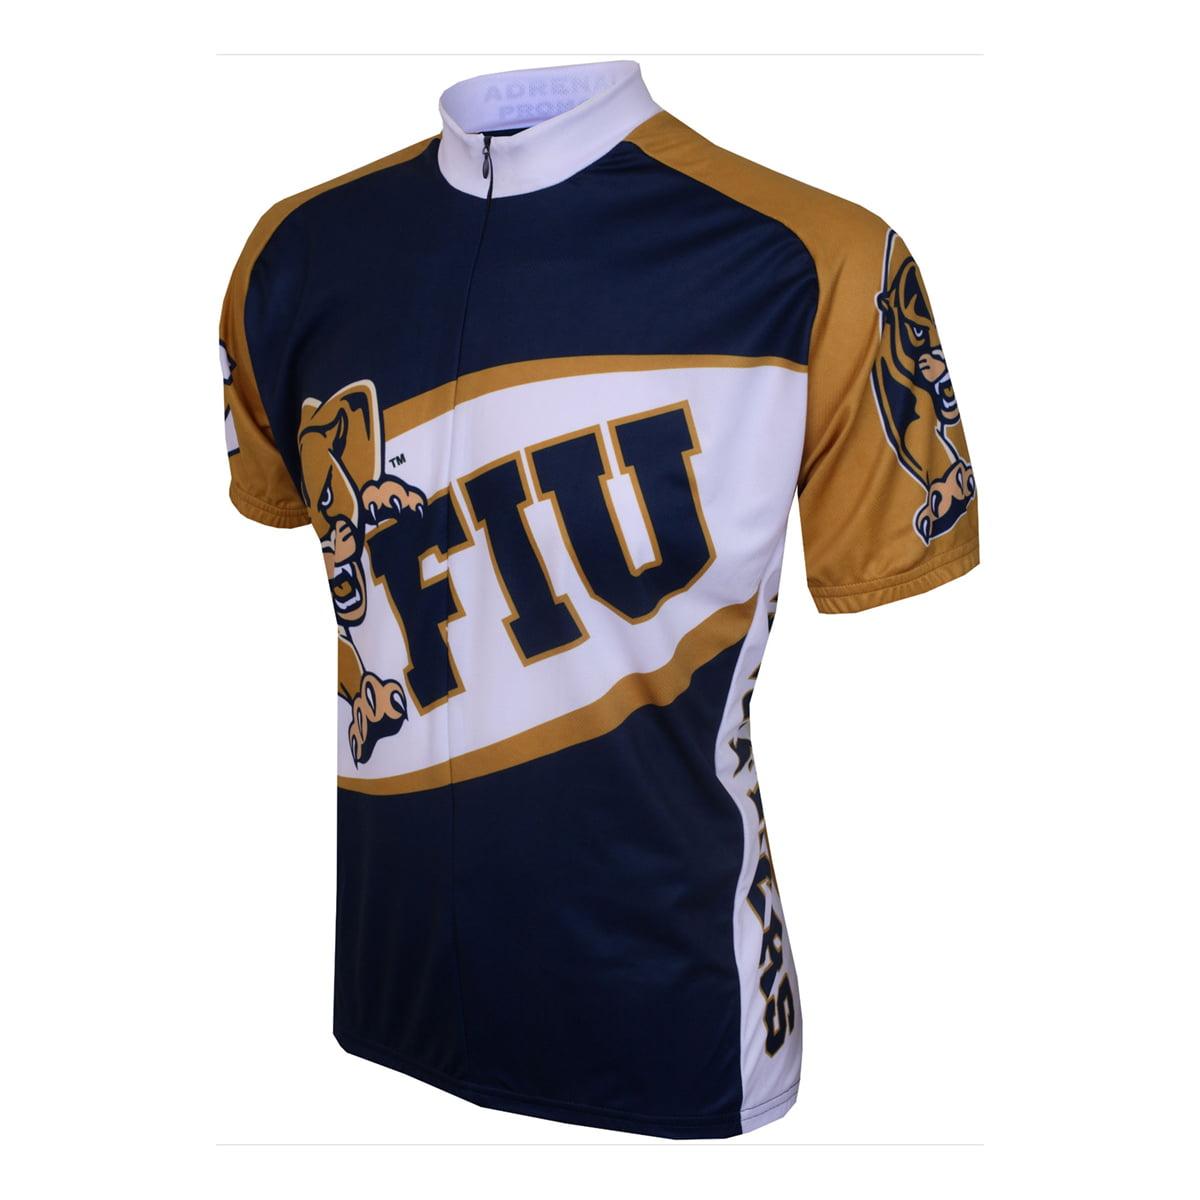 Adrenaline Promotions Florida International University Panthers Cycling Jersey